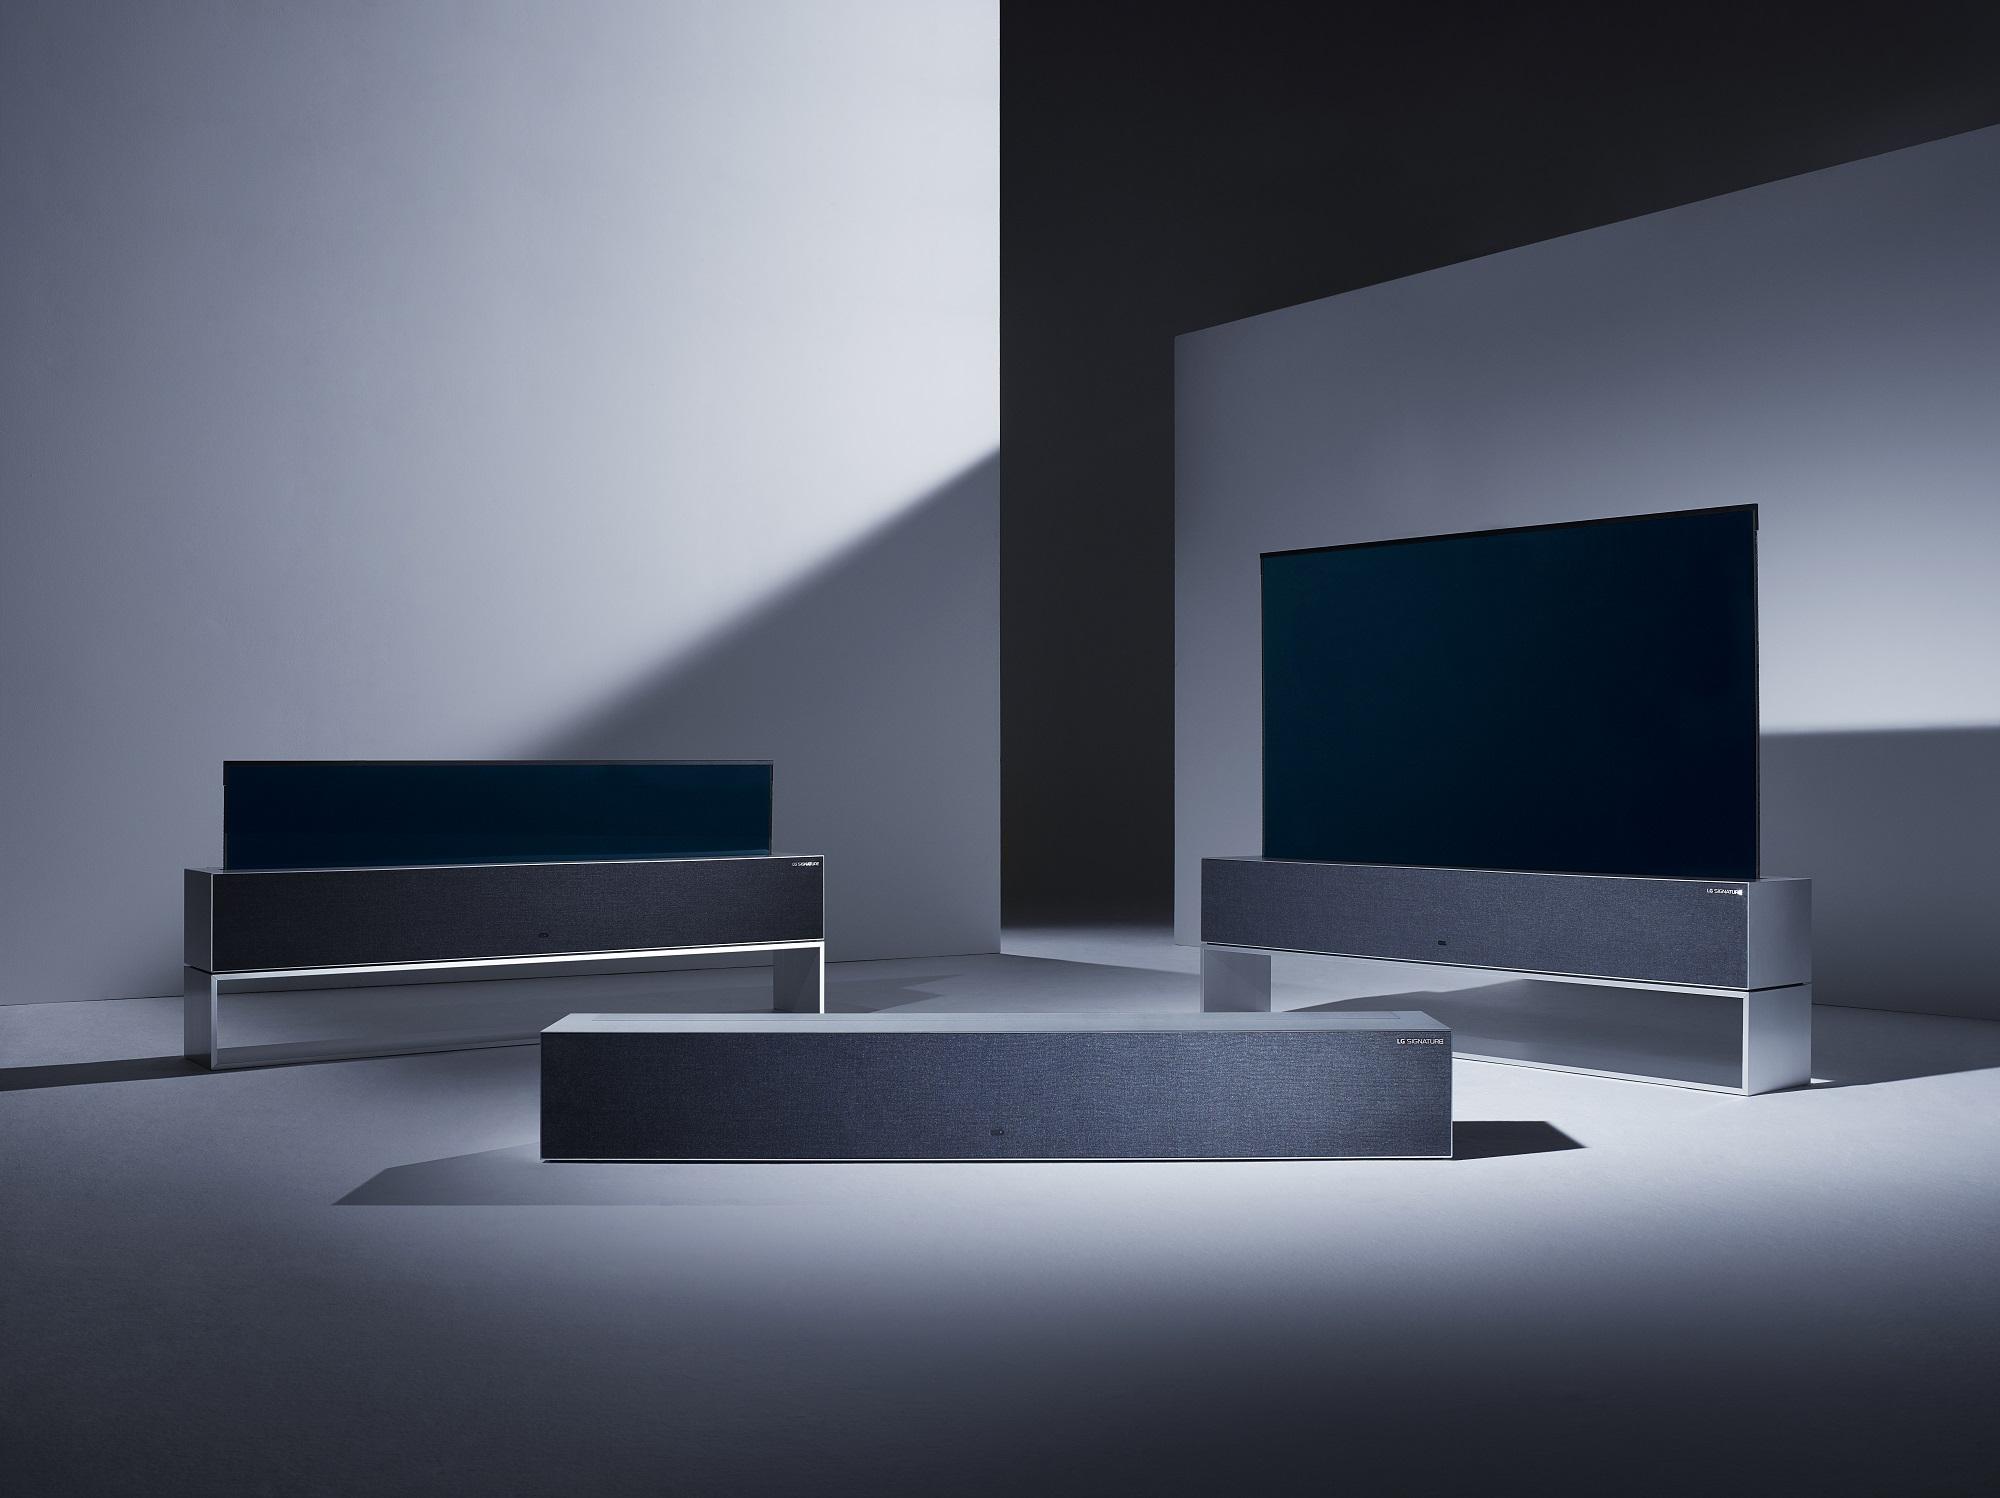 LG 시그니처 올레드 TV R 제품 이미지